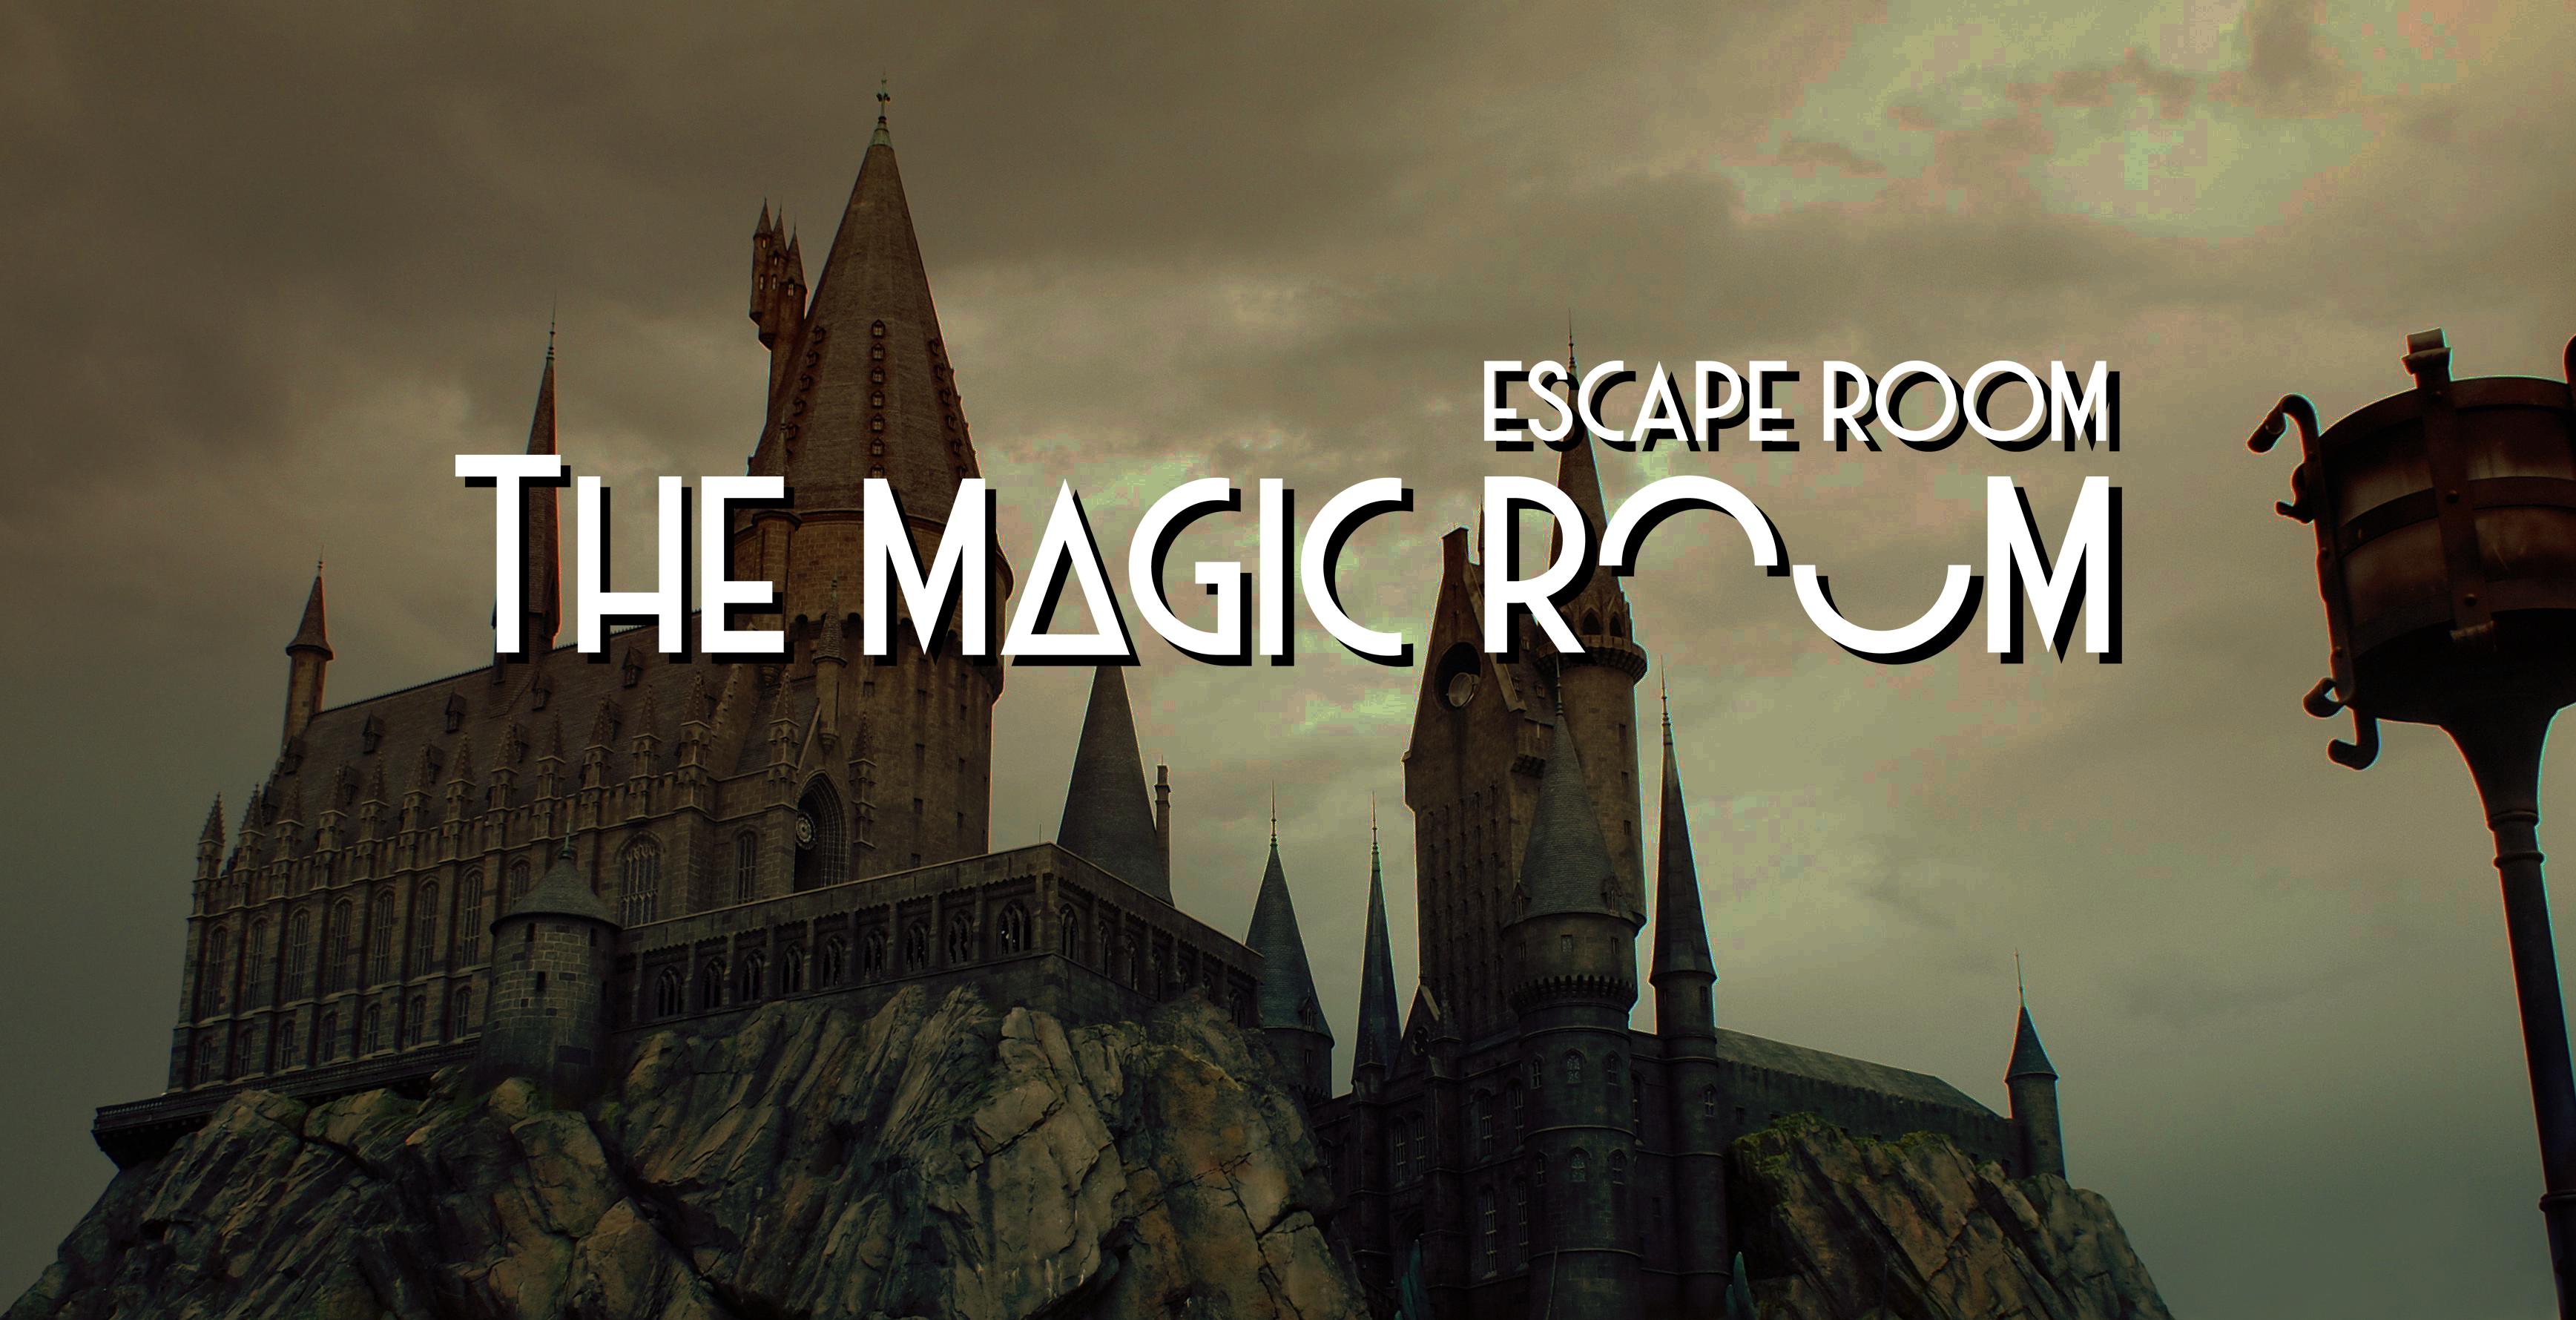 the-magic-room-harry-potter-escape-room